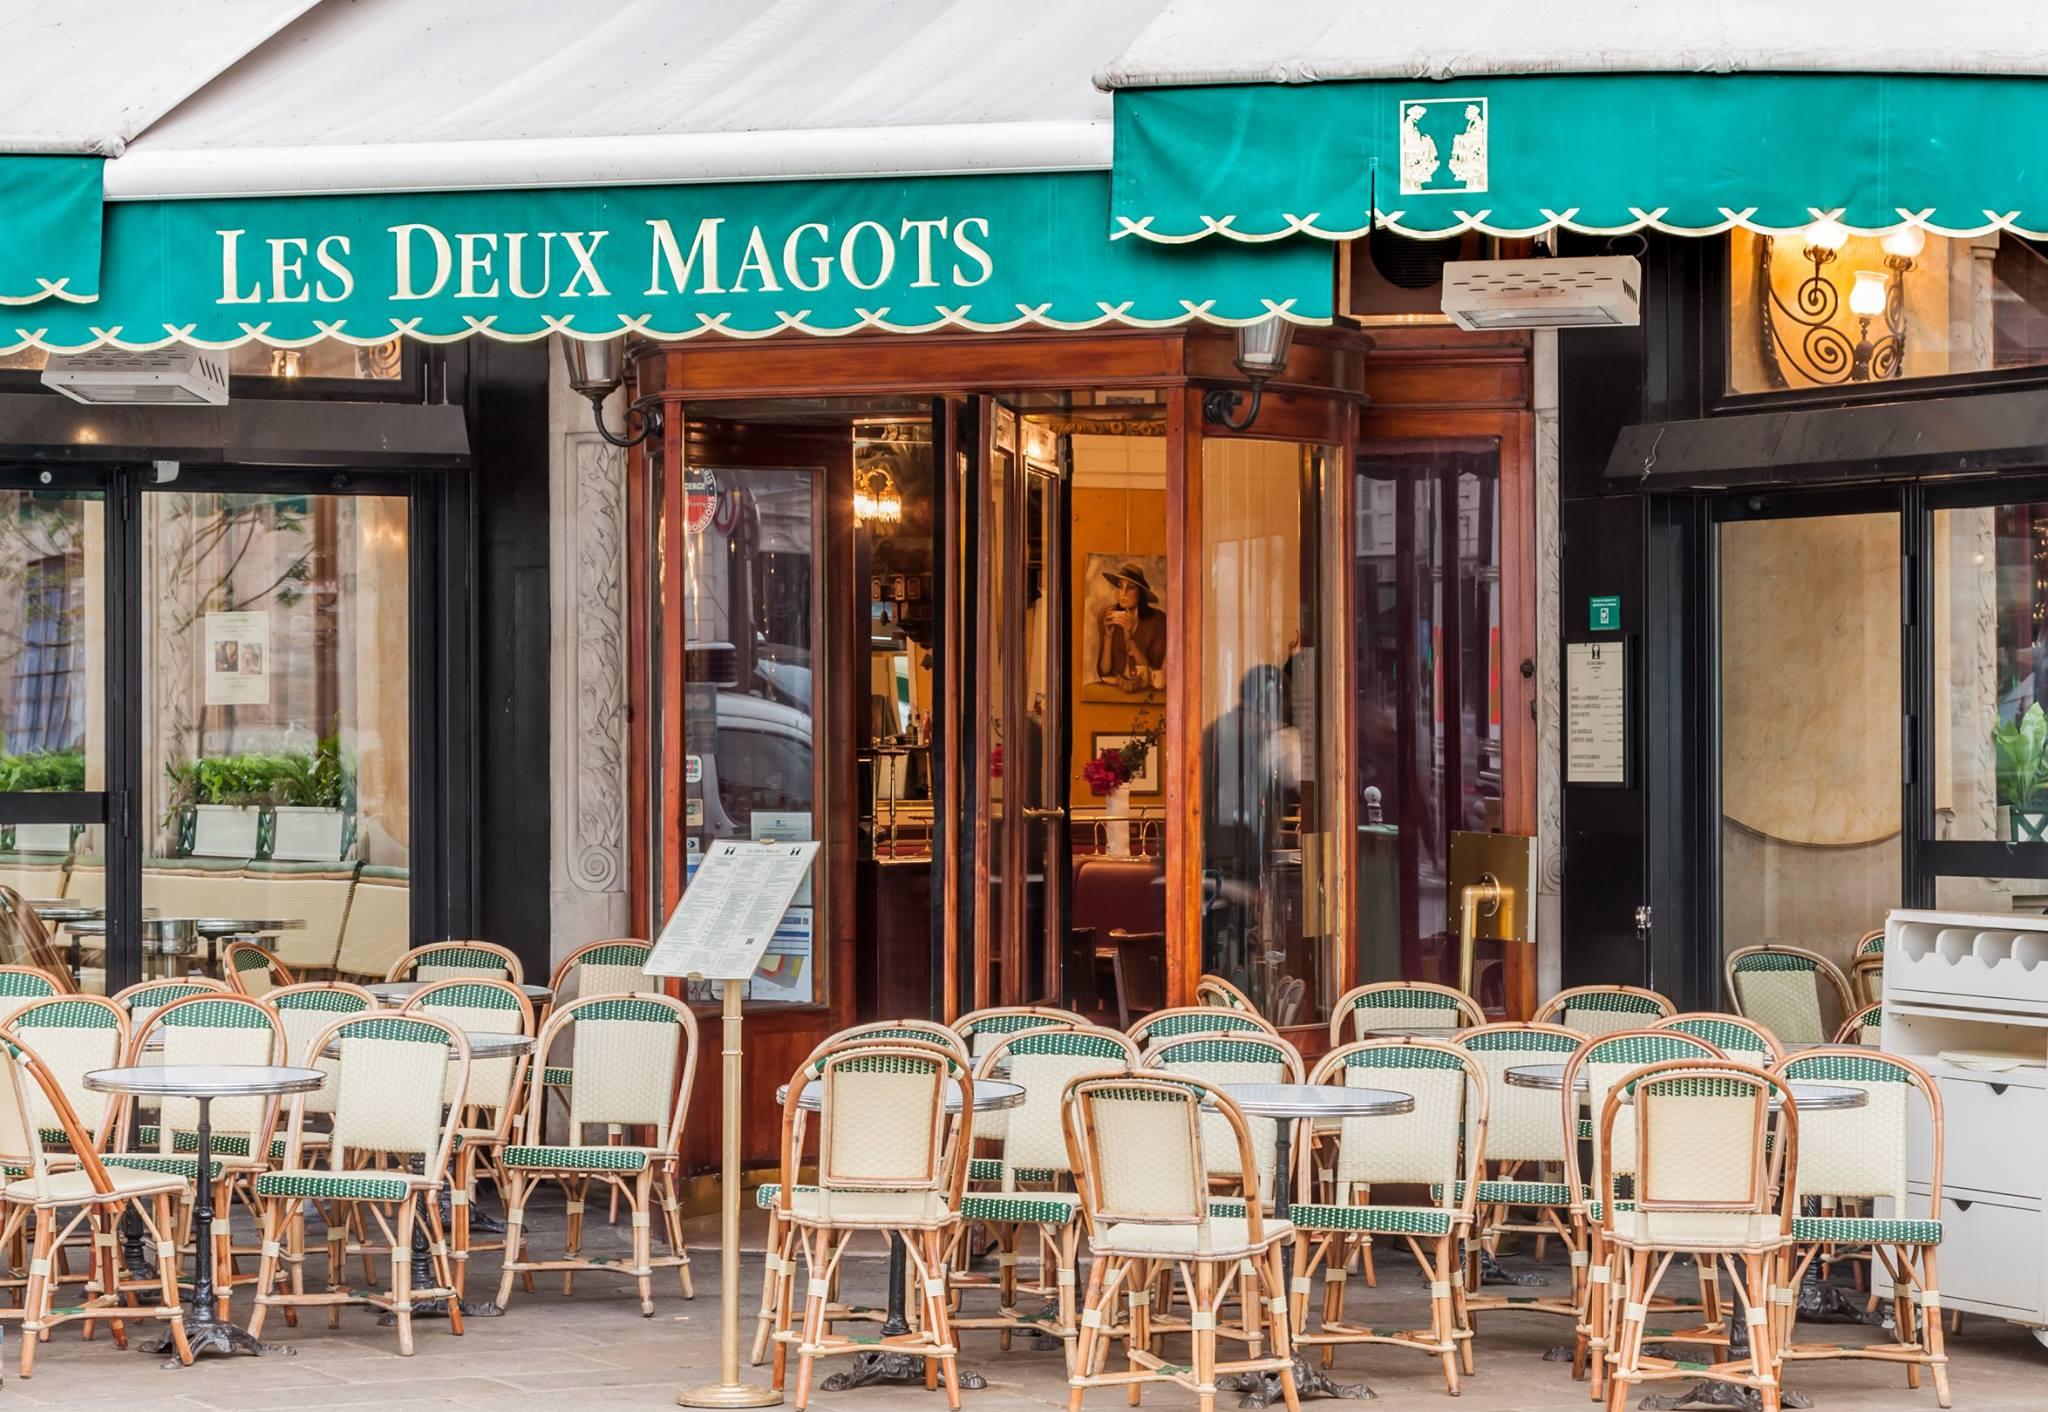 Les Deux Magots – Το ιστορικό café του Παρισιού